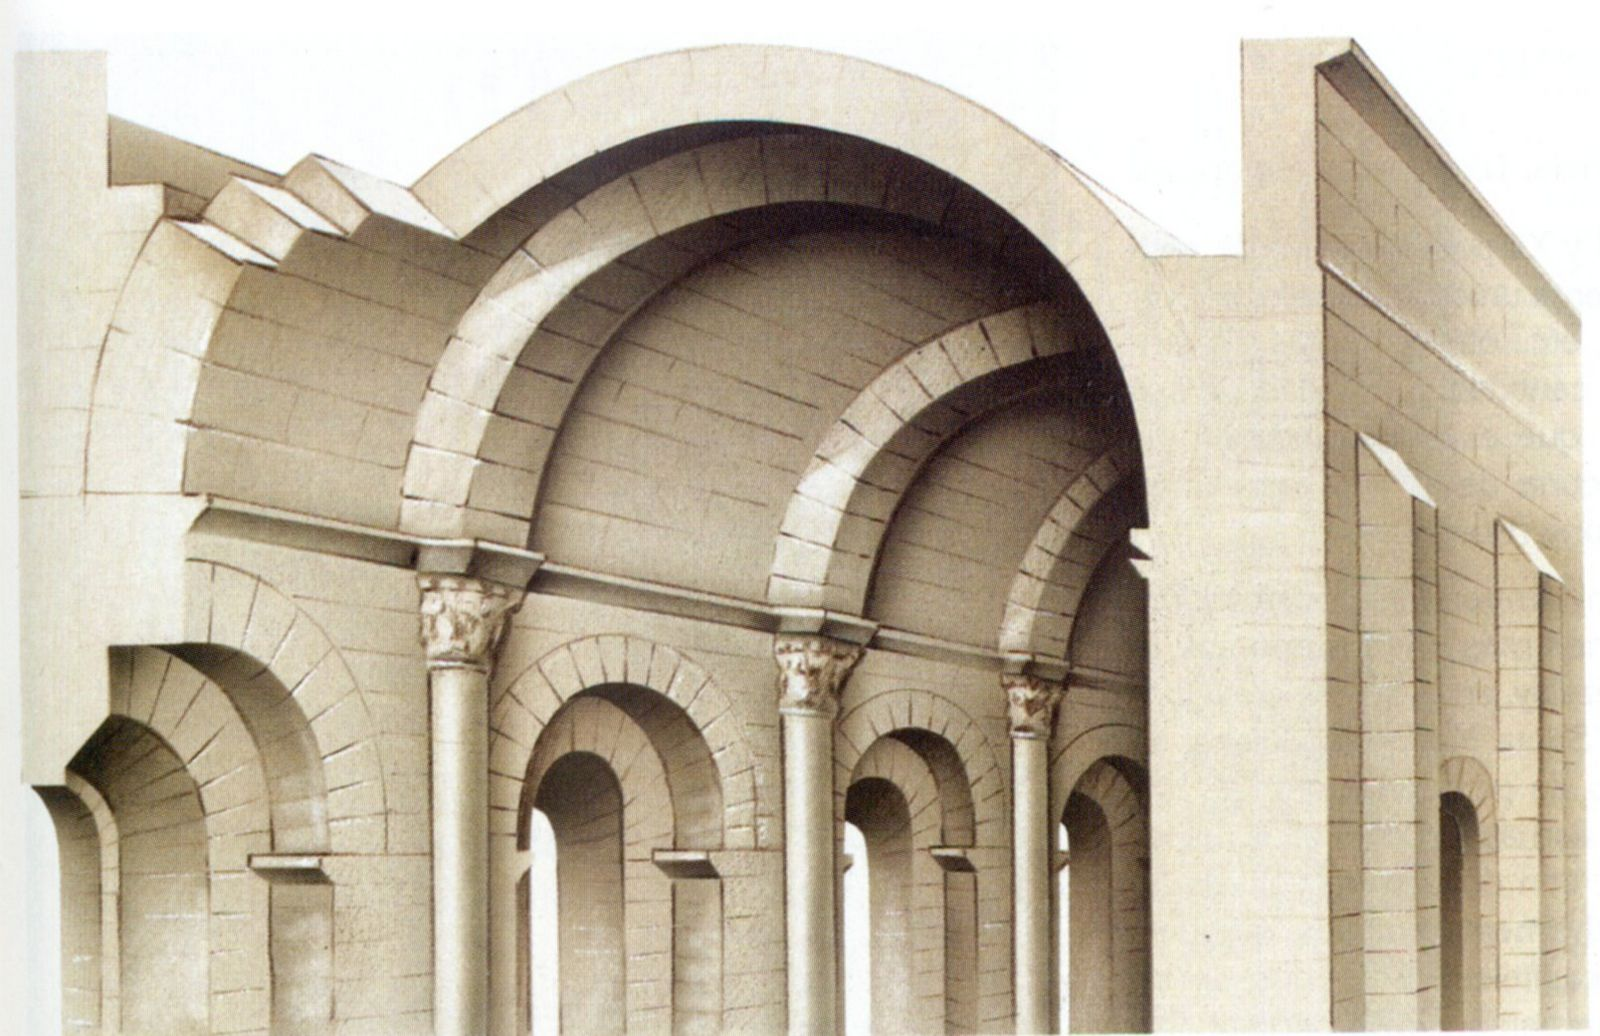 Ipaez arco faj n for Arte arquitectura definicion